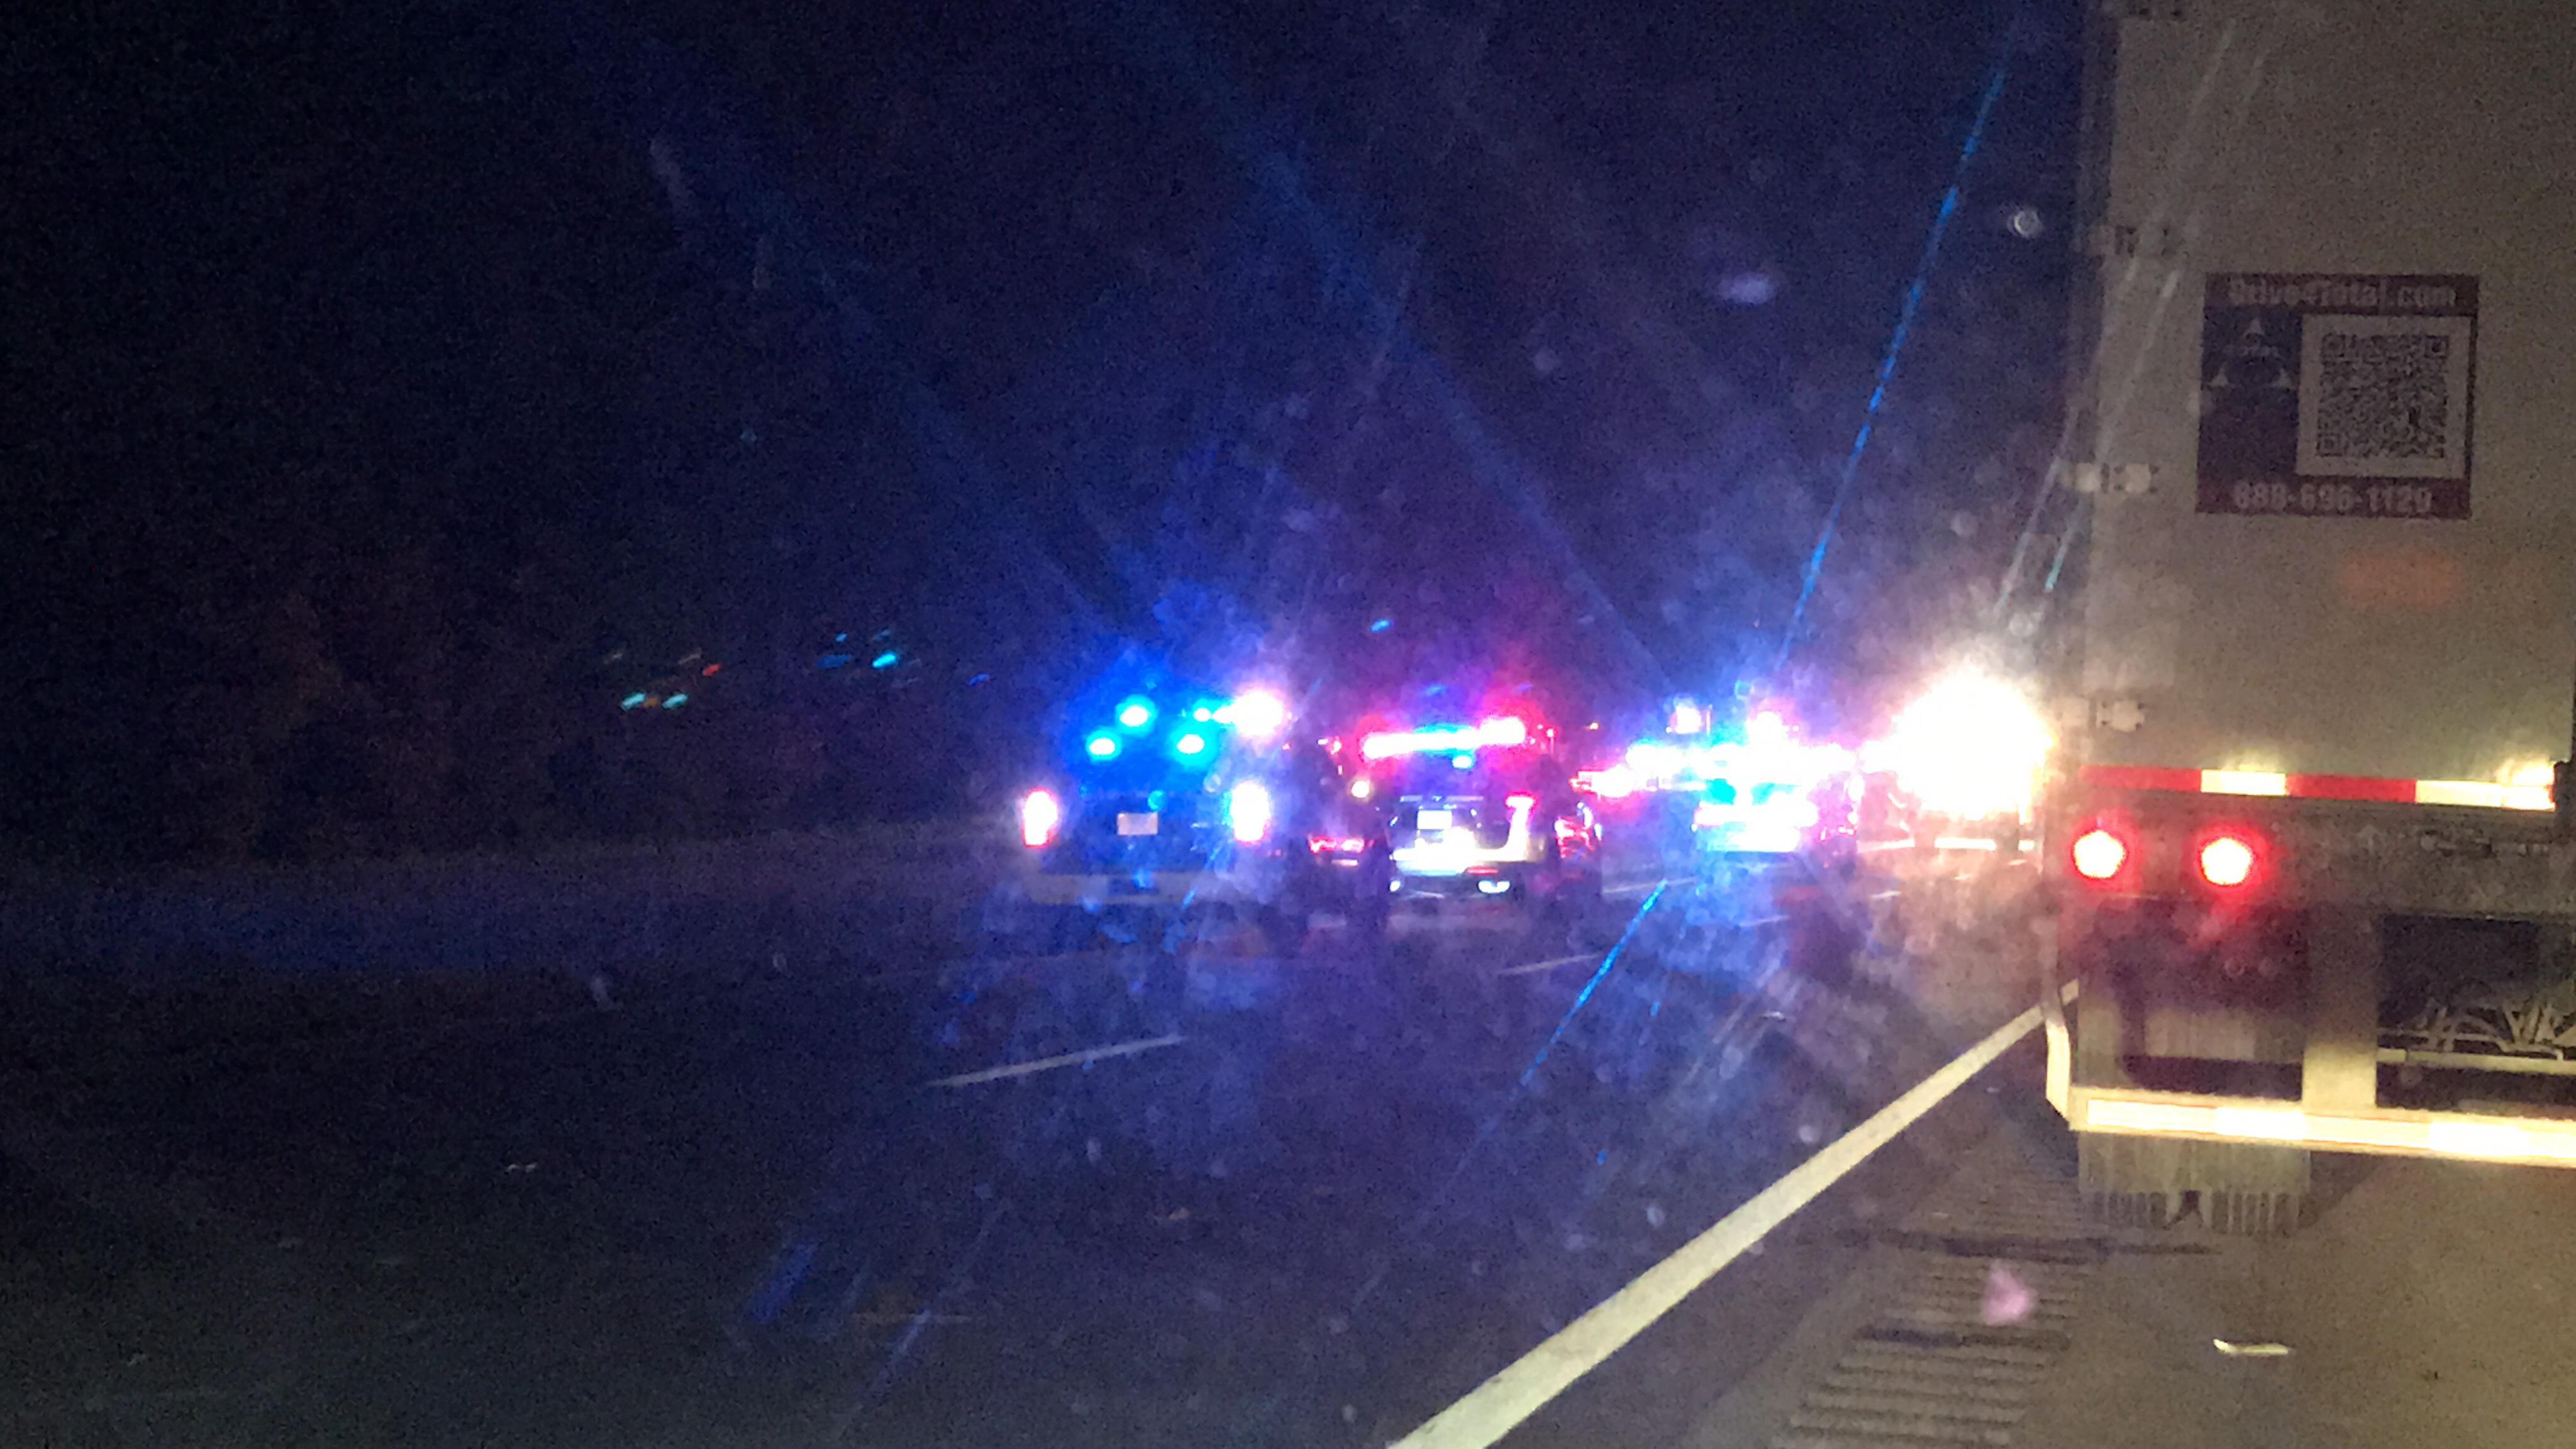 UPDATE: Both drivers injured, taken to hospitals after crash